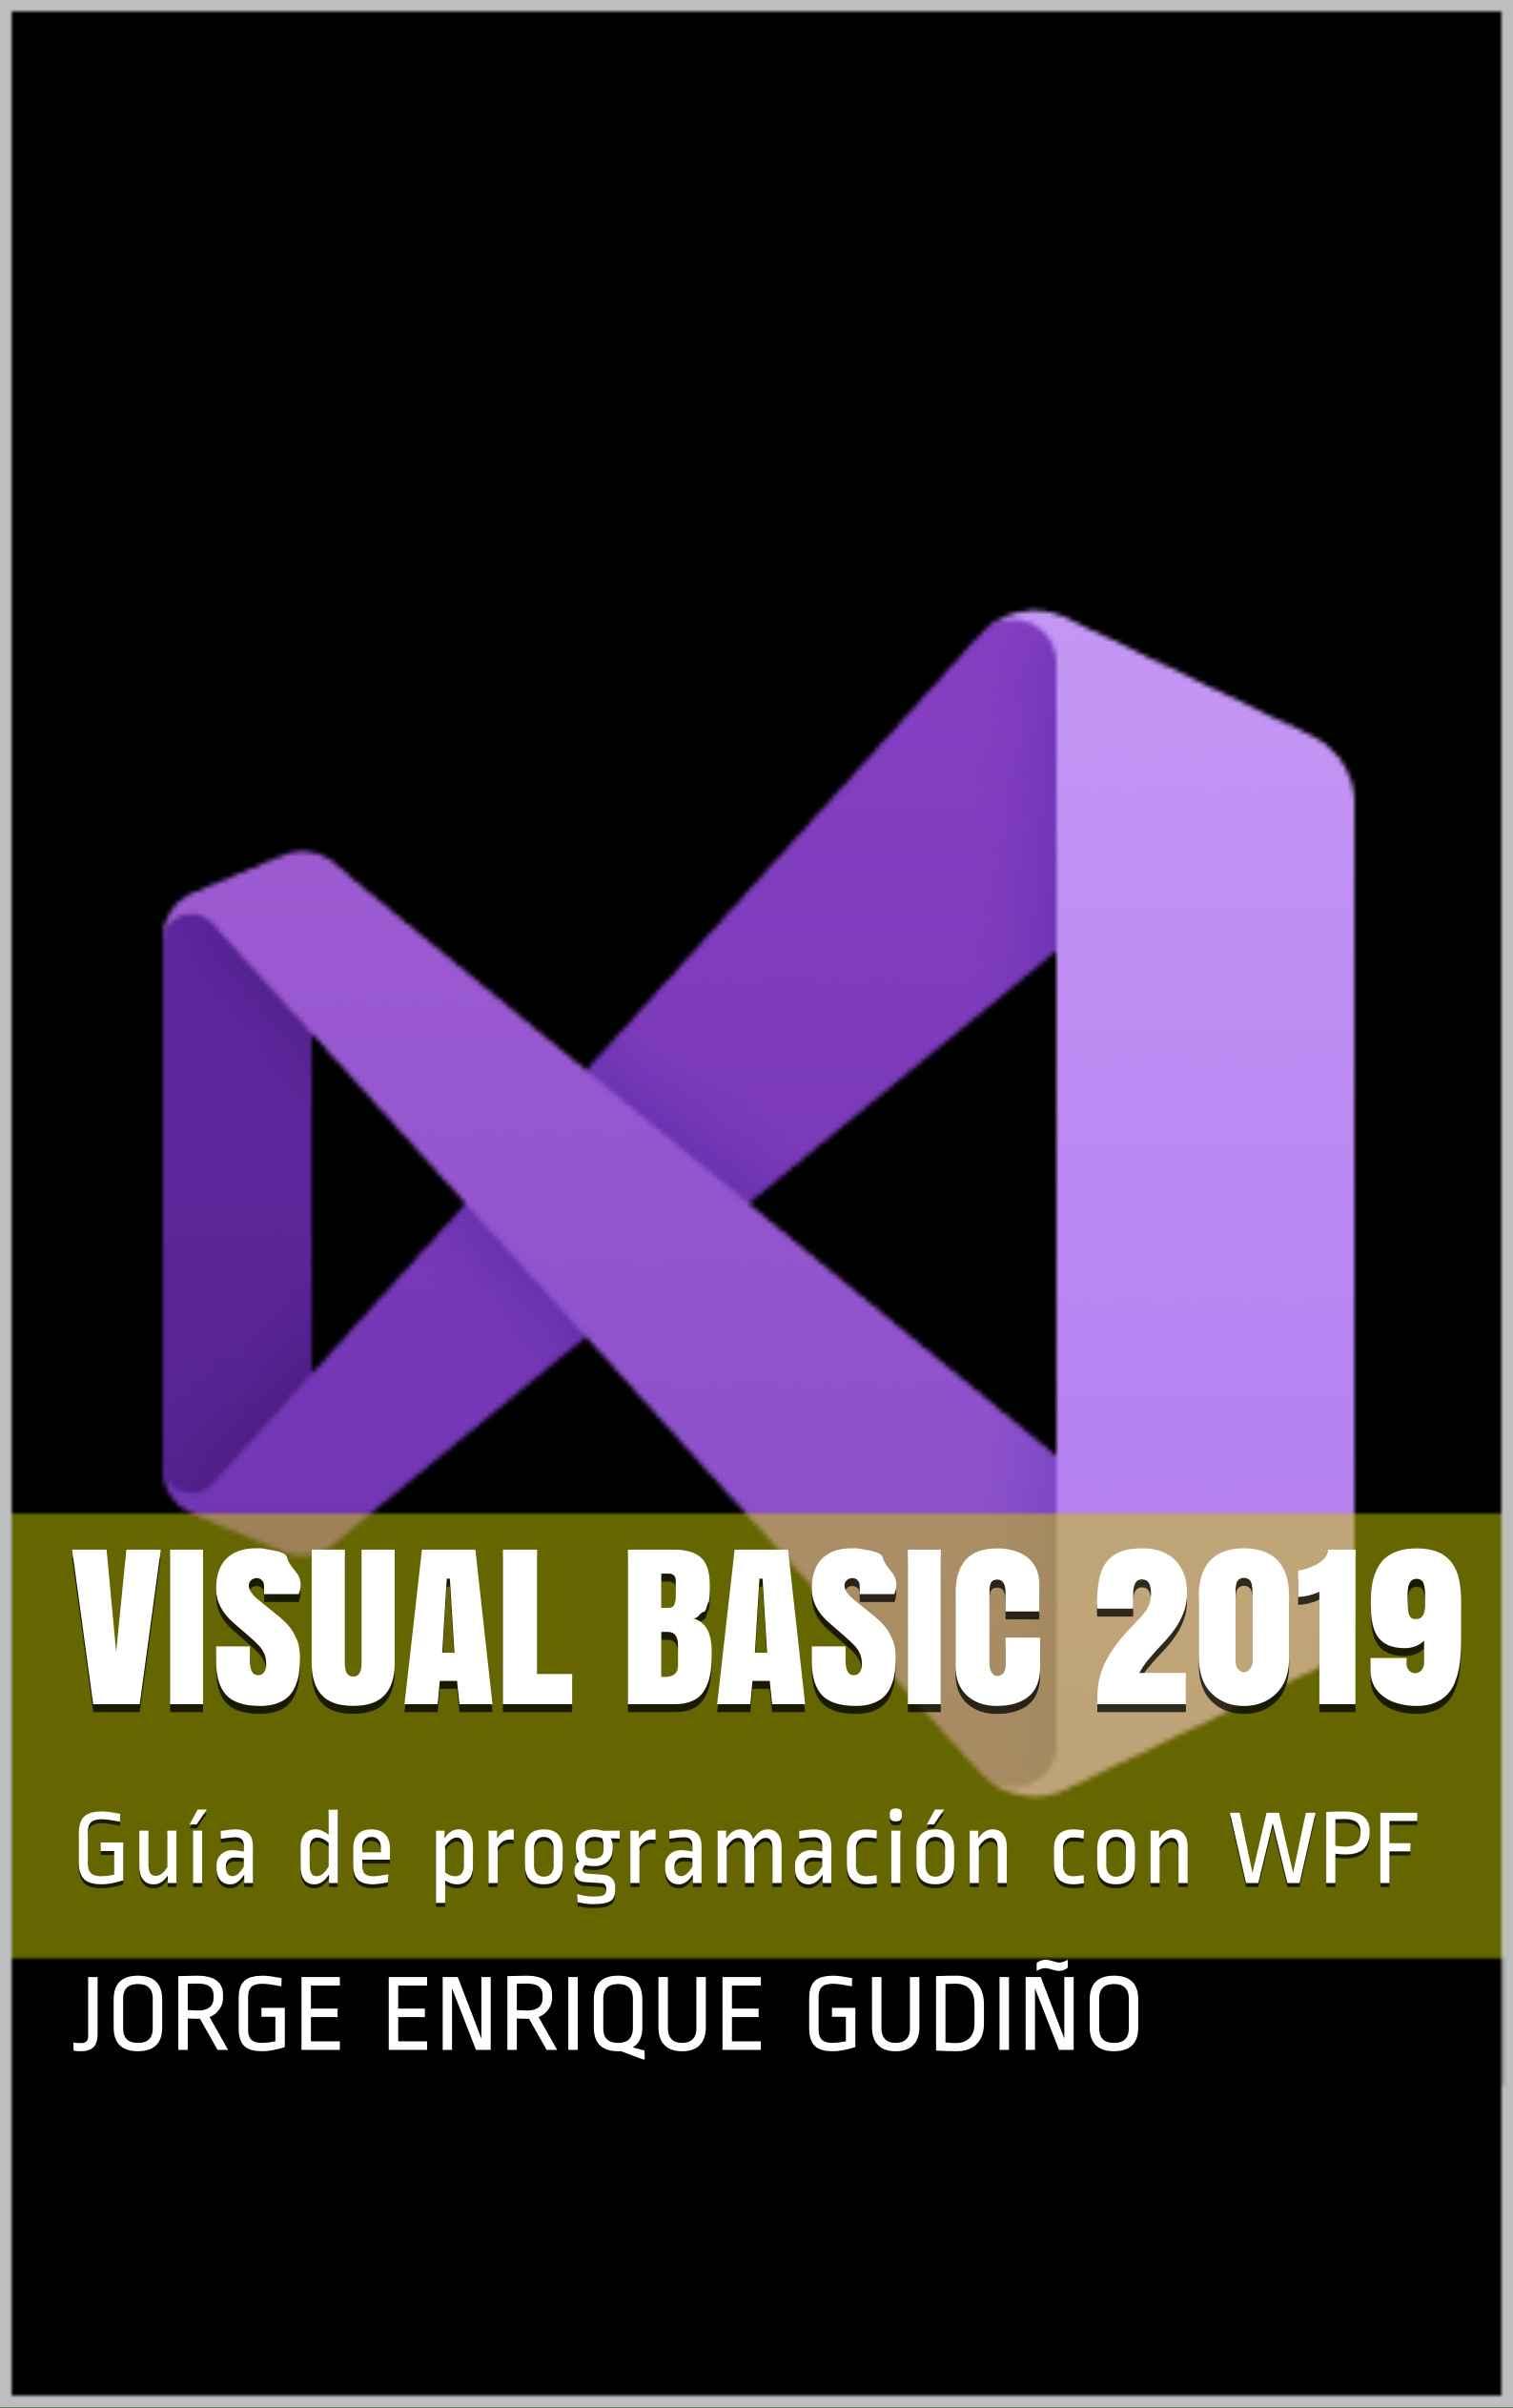 Visual Basic 2019 de Jorge Enrique Gudiño